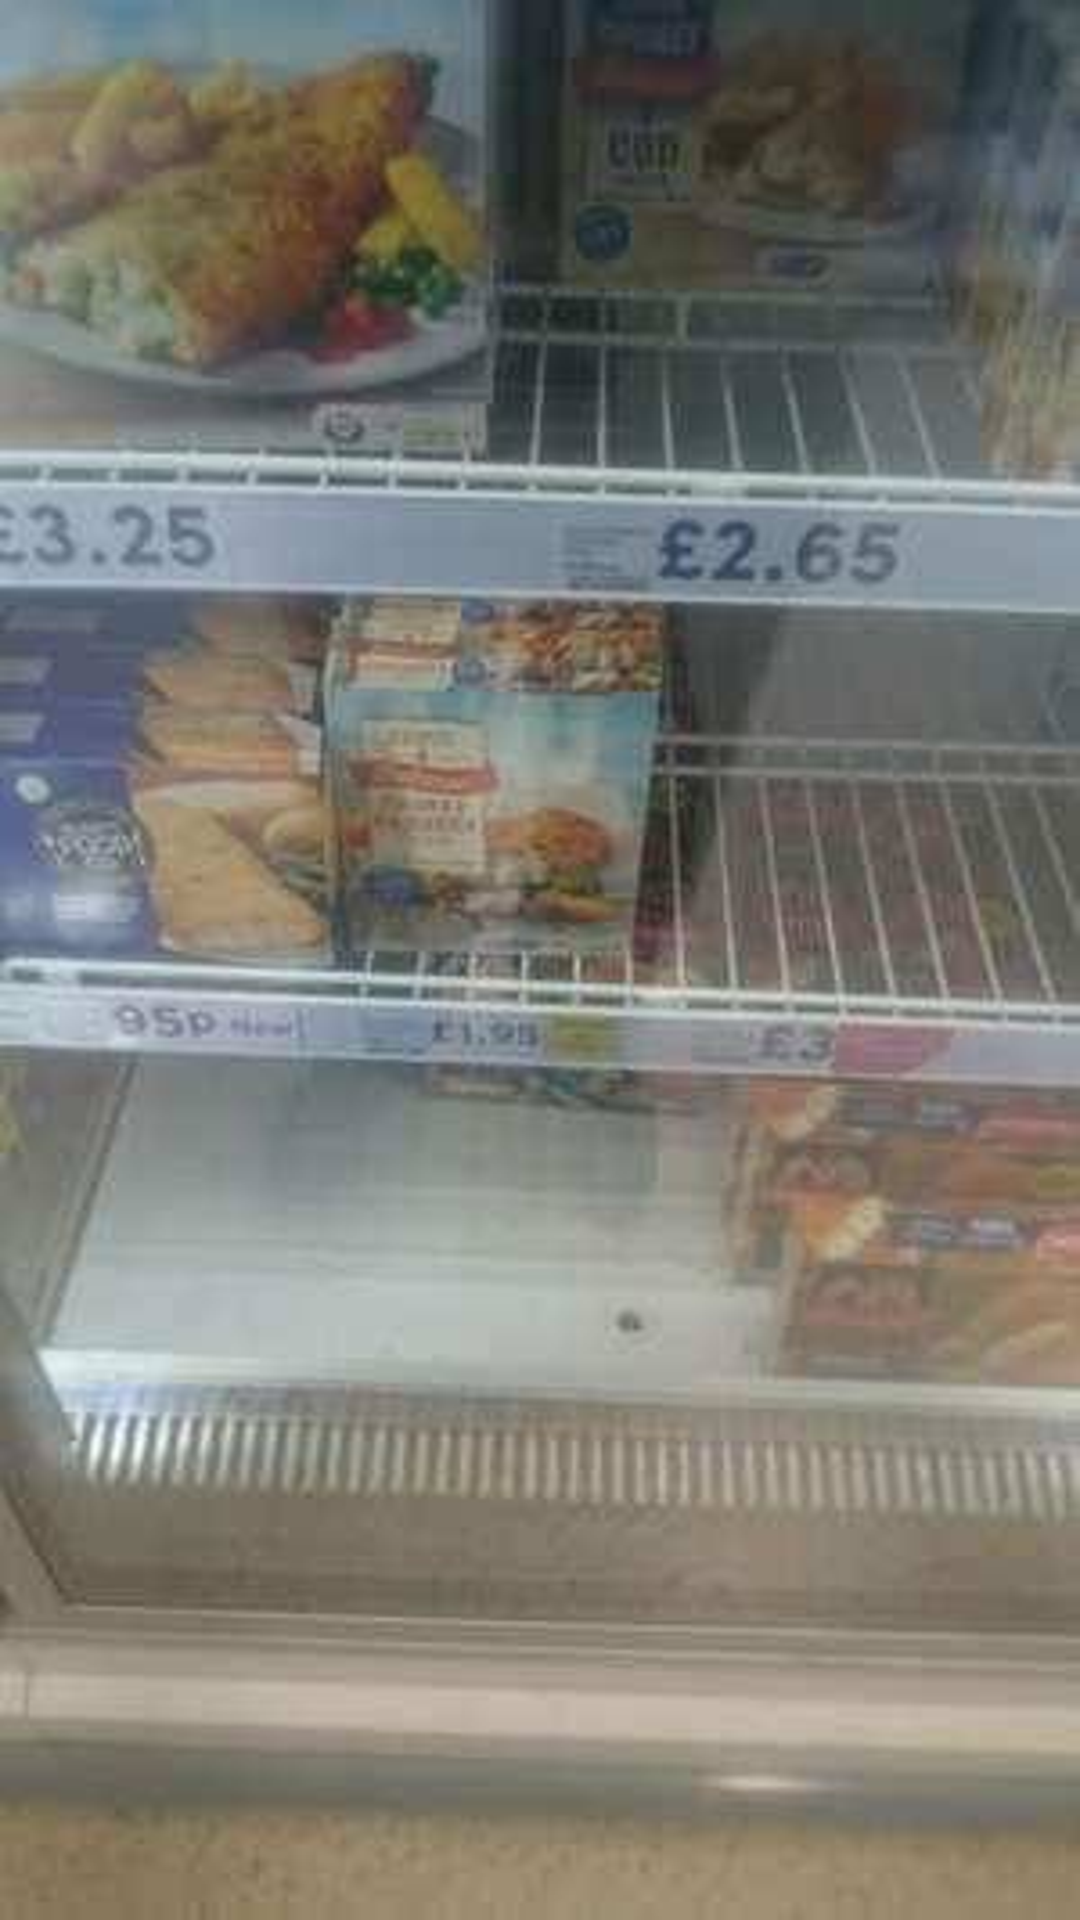 4 chunky haddock fillets £1.95 instore @ Tesco - Wisbech